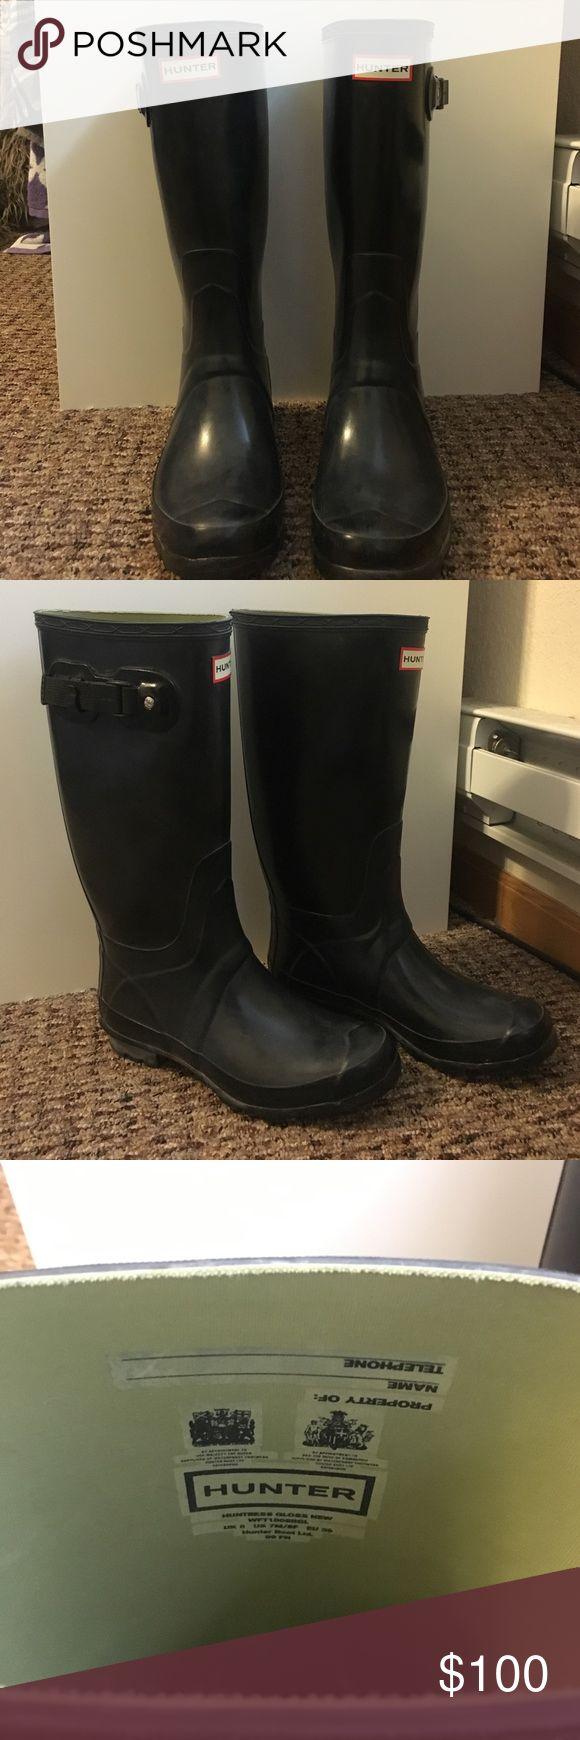 Black Non-Glossy Wide Calf Hunter Boots Black non-glossy hunter boots. Only worn a few times (picture of sole above). Women's size 8, men's size 7 Hunter Shoes Winter & Rain Boots